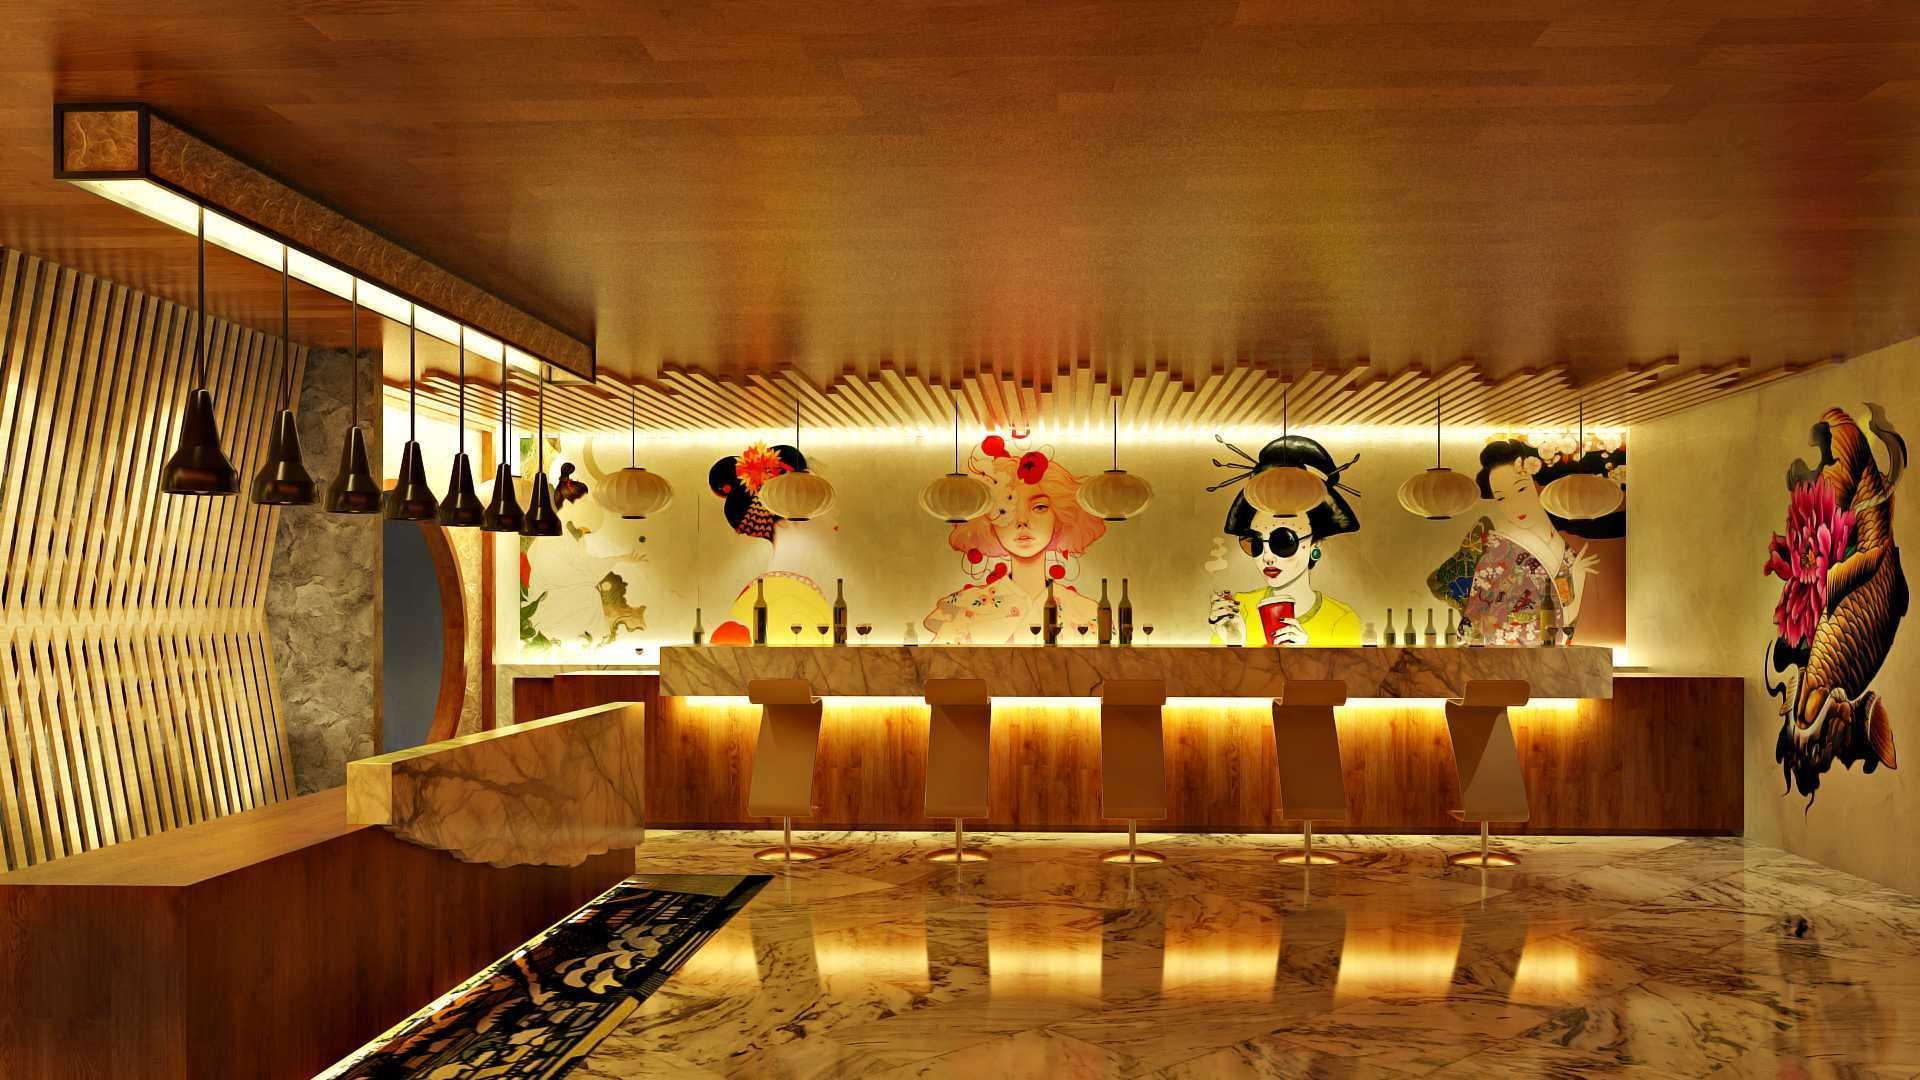 Hive Design & Build Karaoke Alam Sutera Alam Sutera Alam Sutera Reception And Bar Area   26557